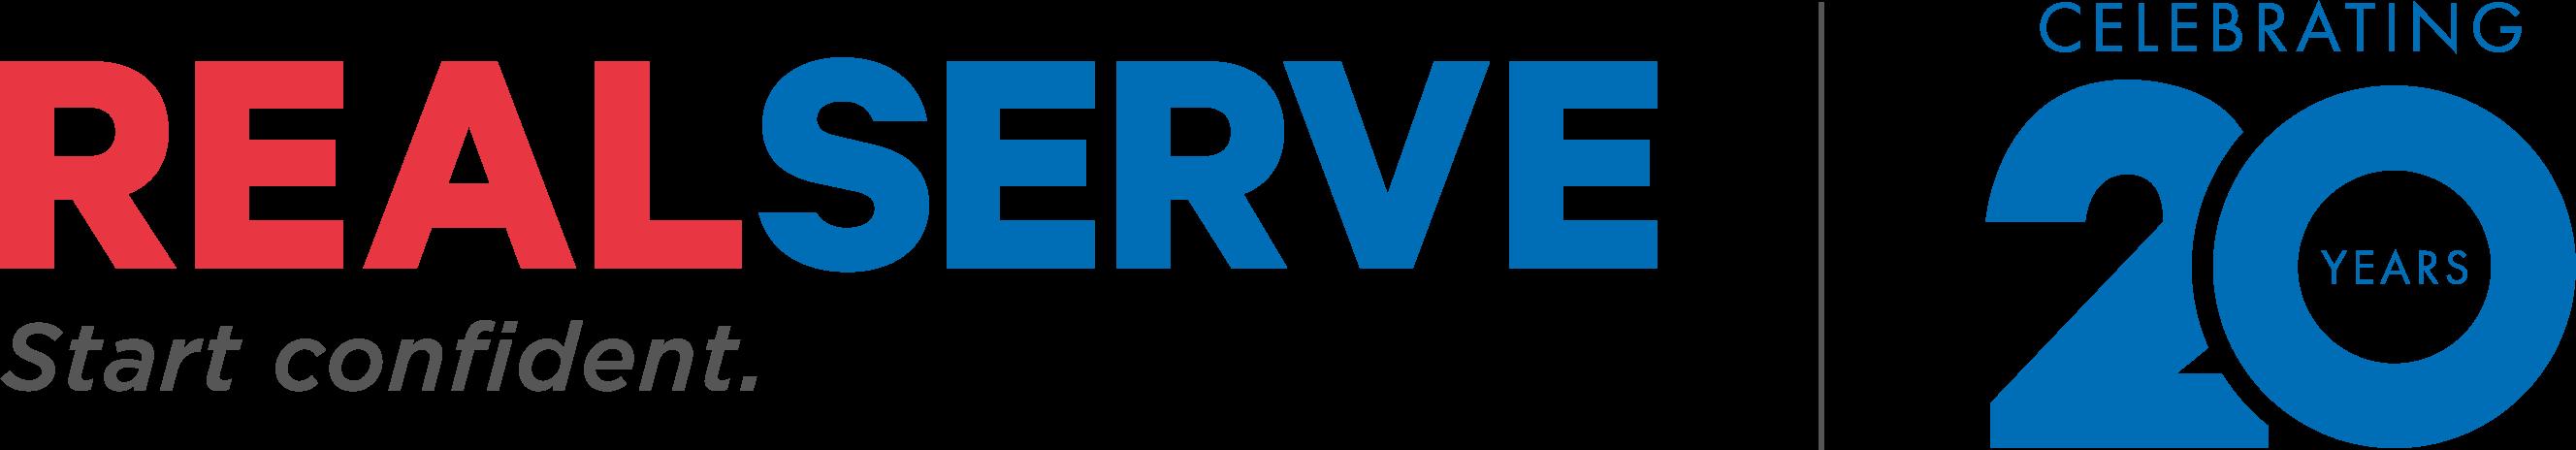 Realserve Pty Ltd Australian Property Surveys and Measurement Logo